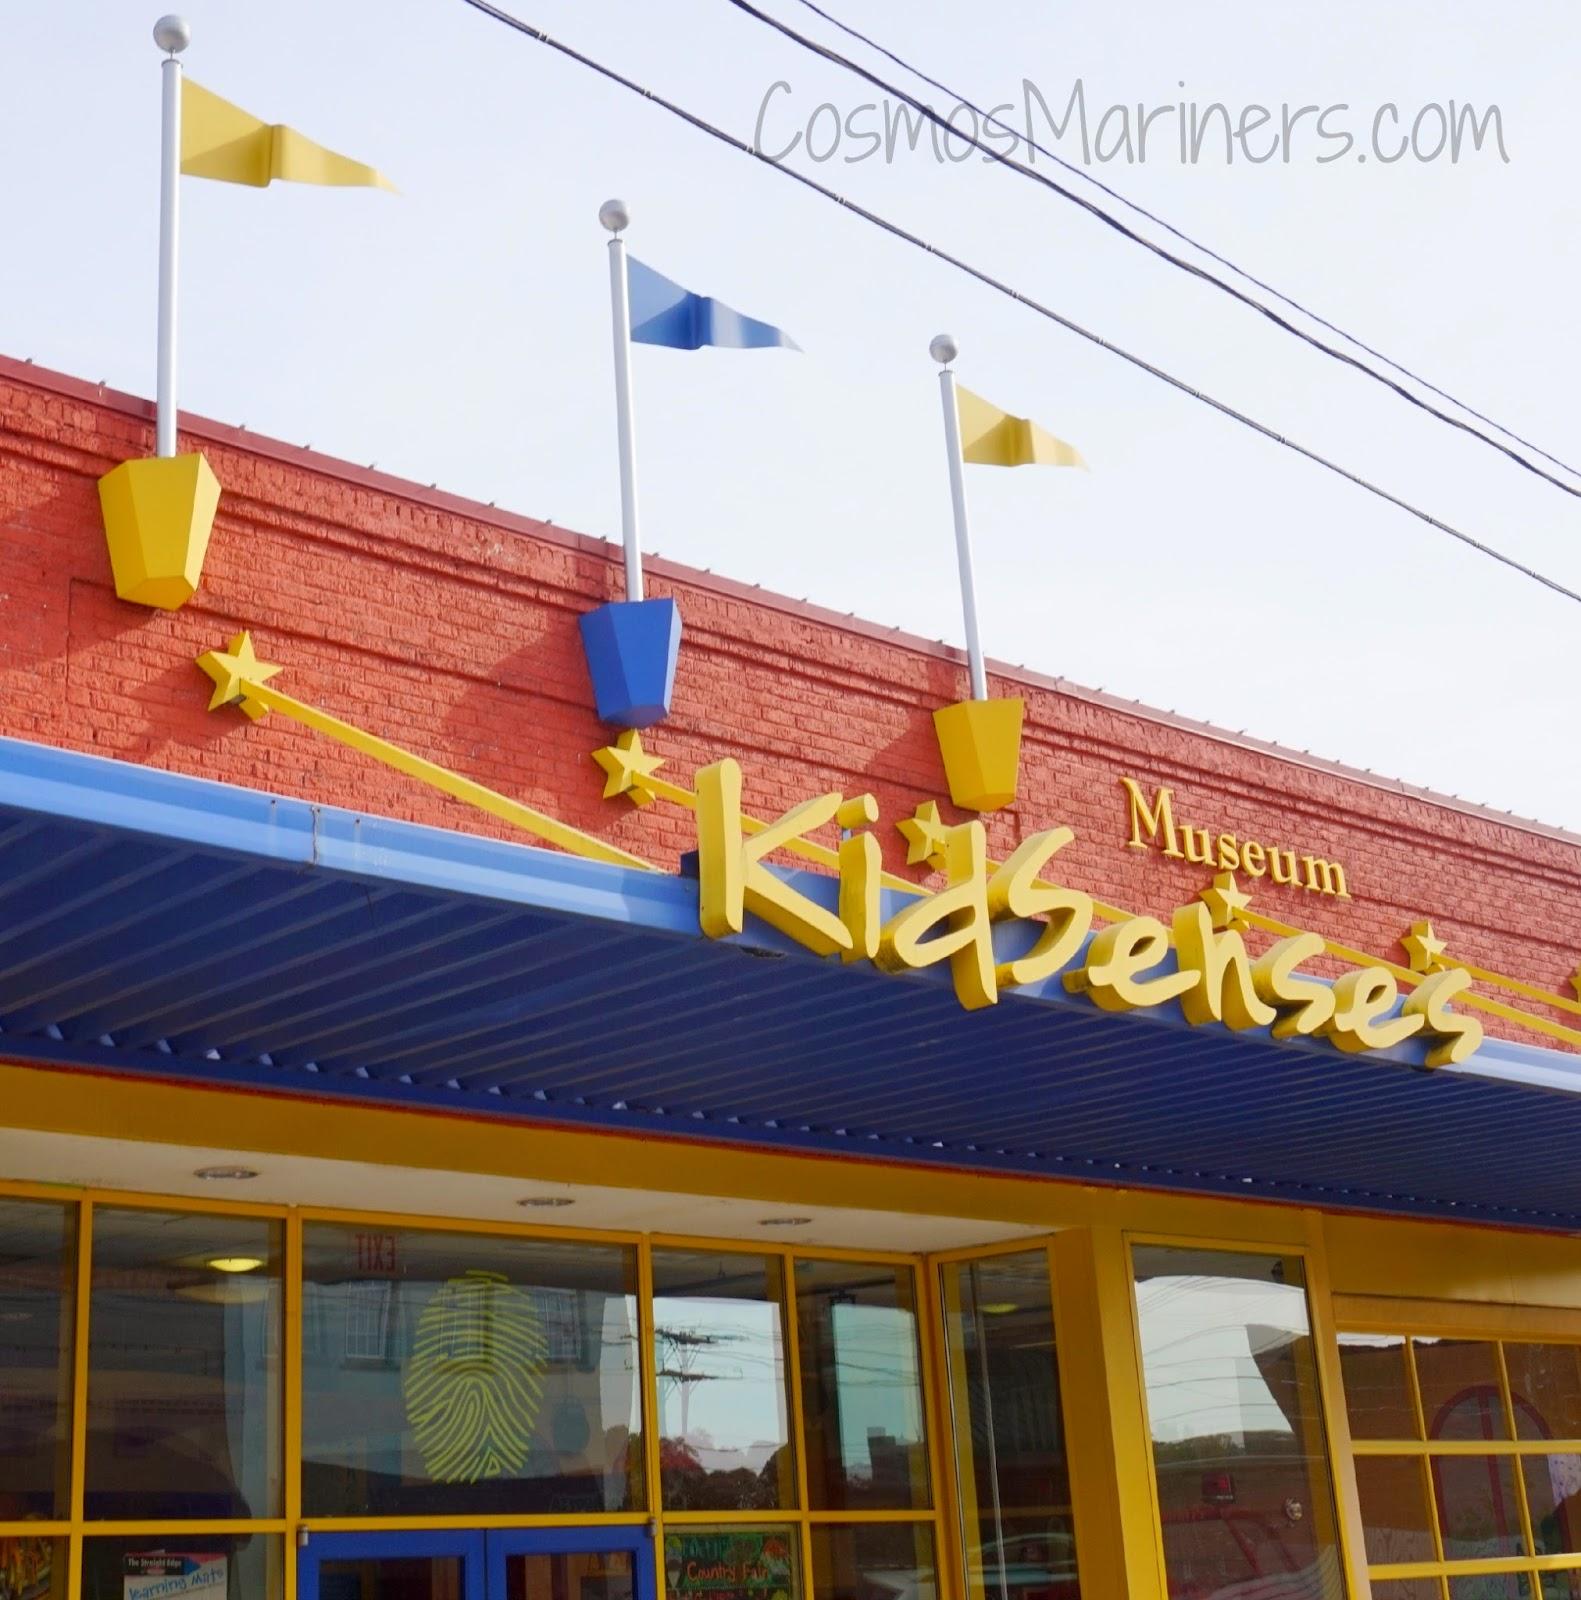 Kid Senses Museum, Rutherfordton, North Carolina   CosmosMariners.com